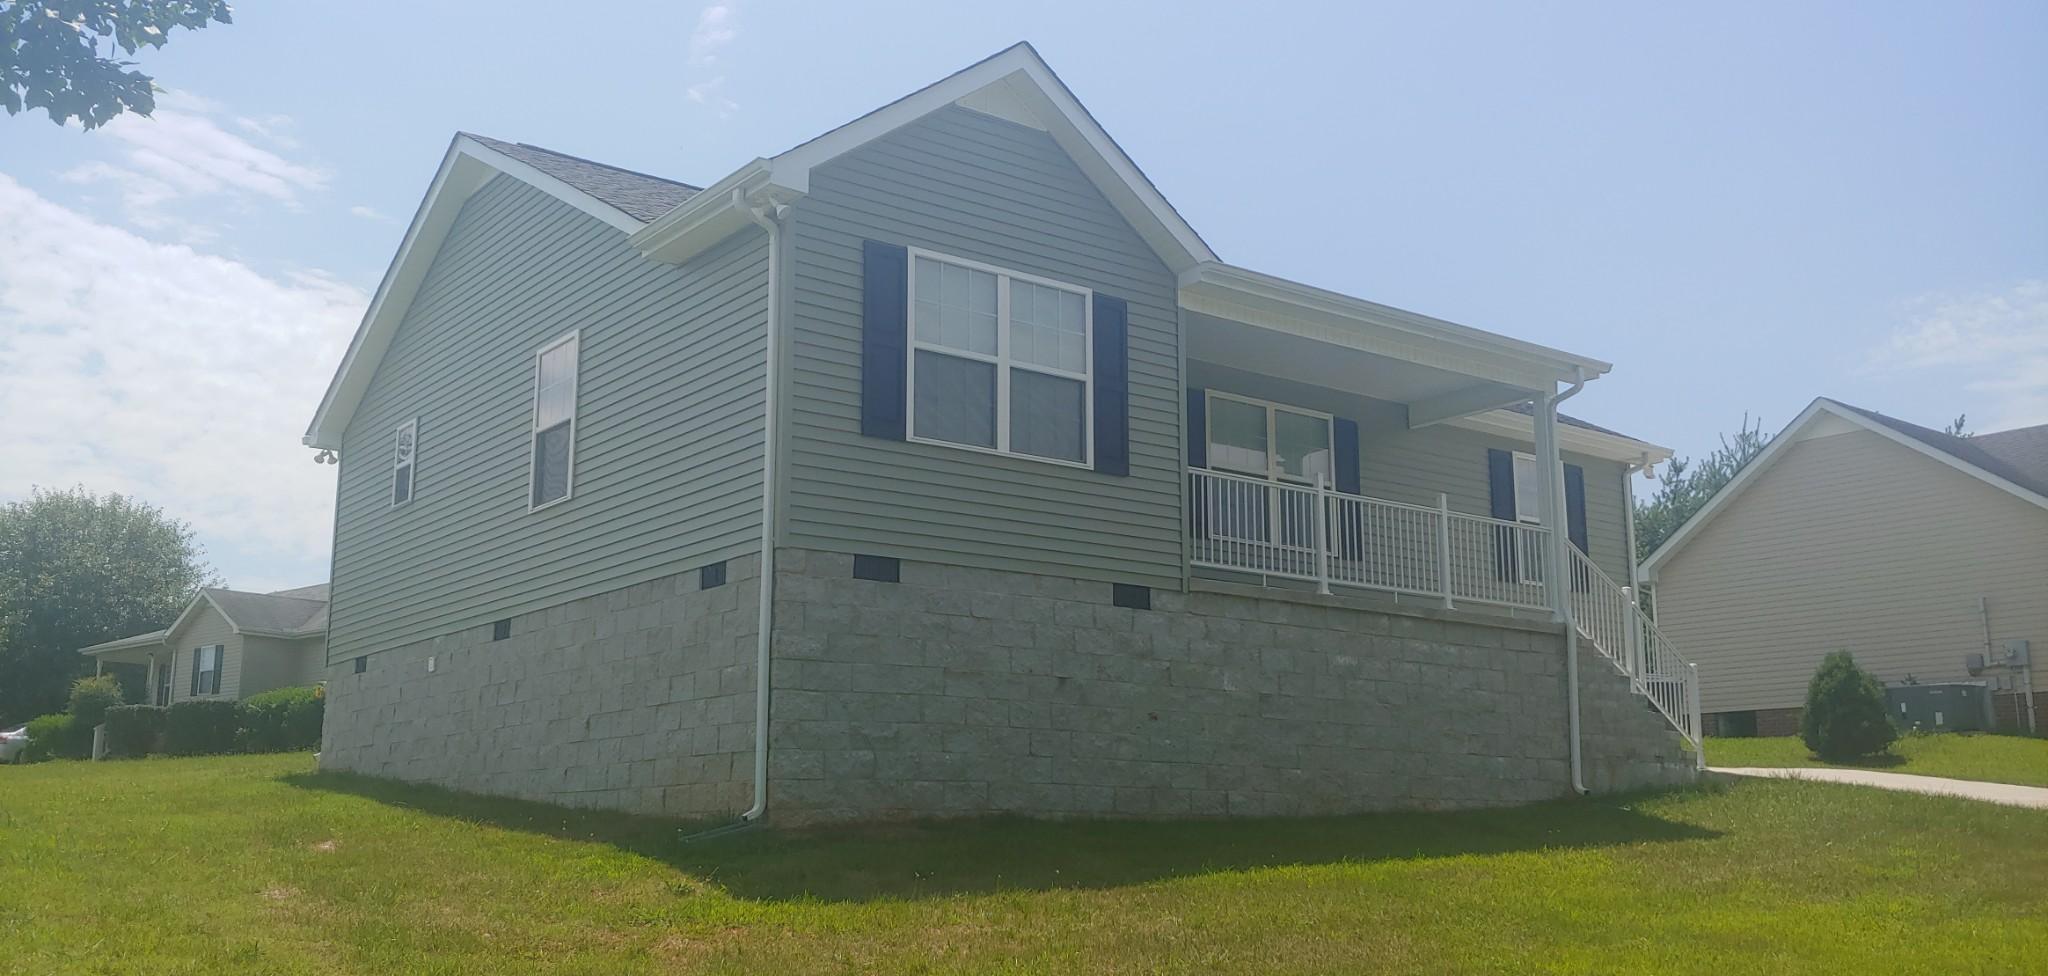 165 Duck Hawk Dr, Mc Minnville, TN 37110 - Mc Minnville, TN real estate listing